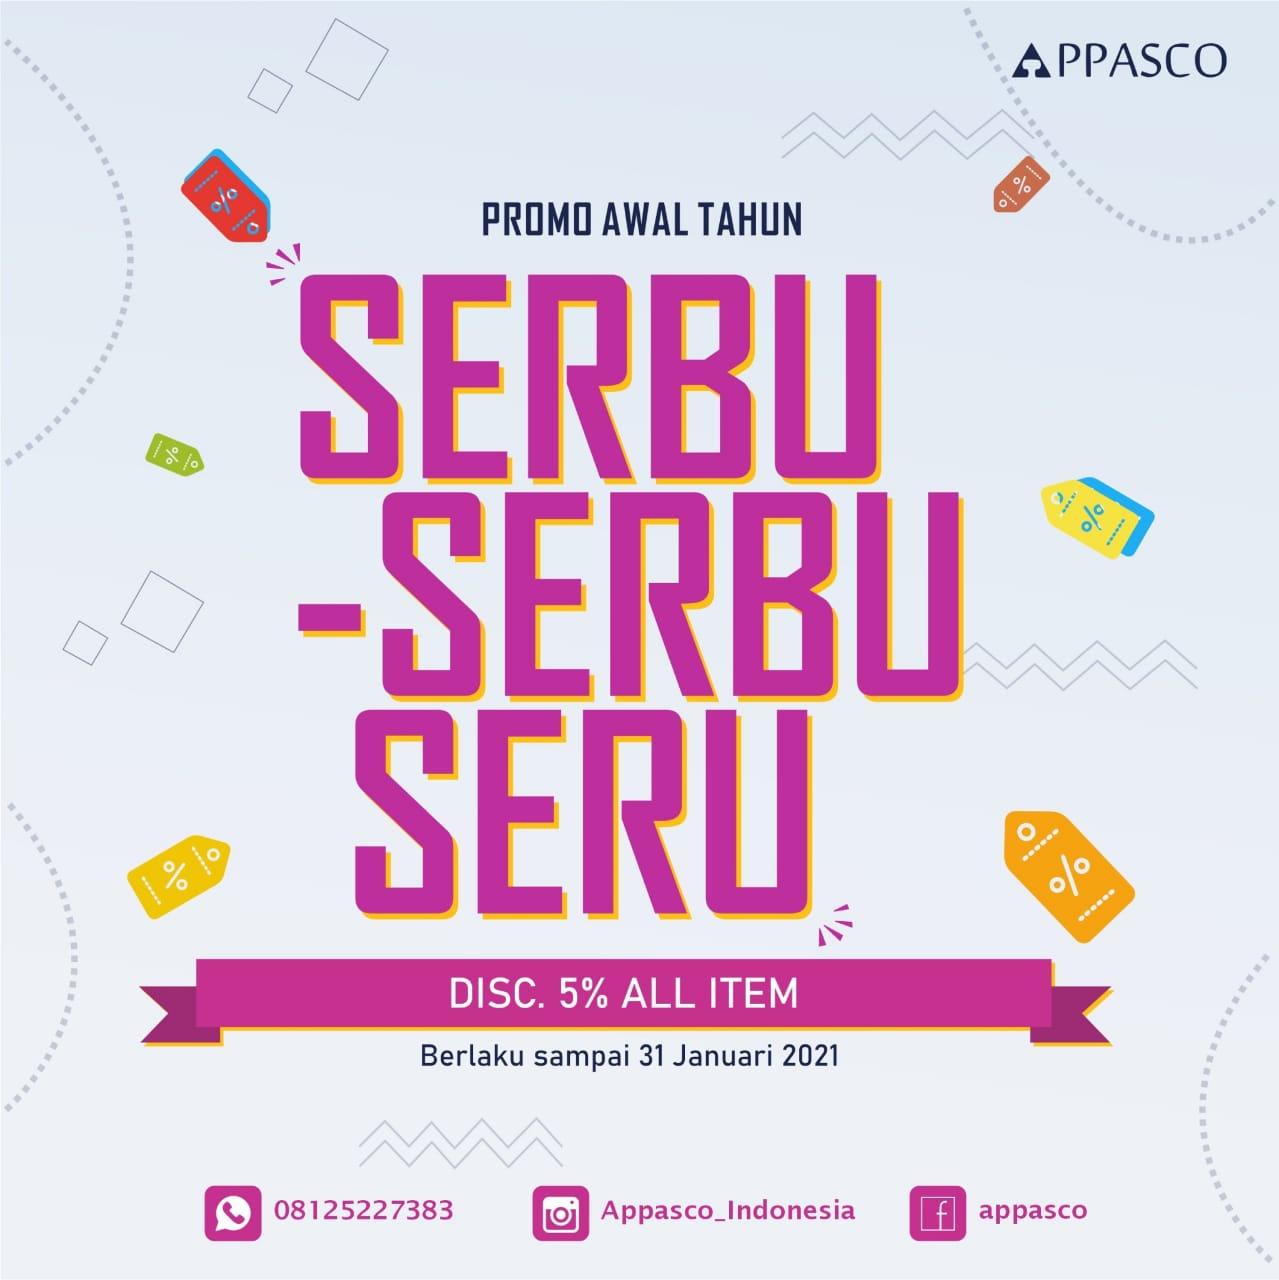 Promo Awal Tahun 2021 APPASCO